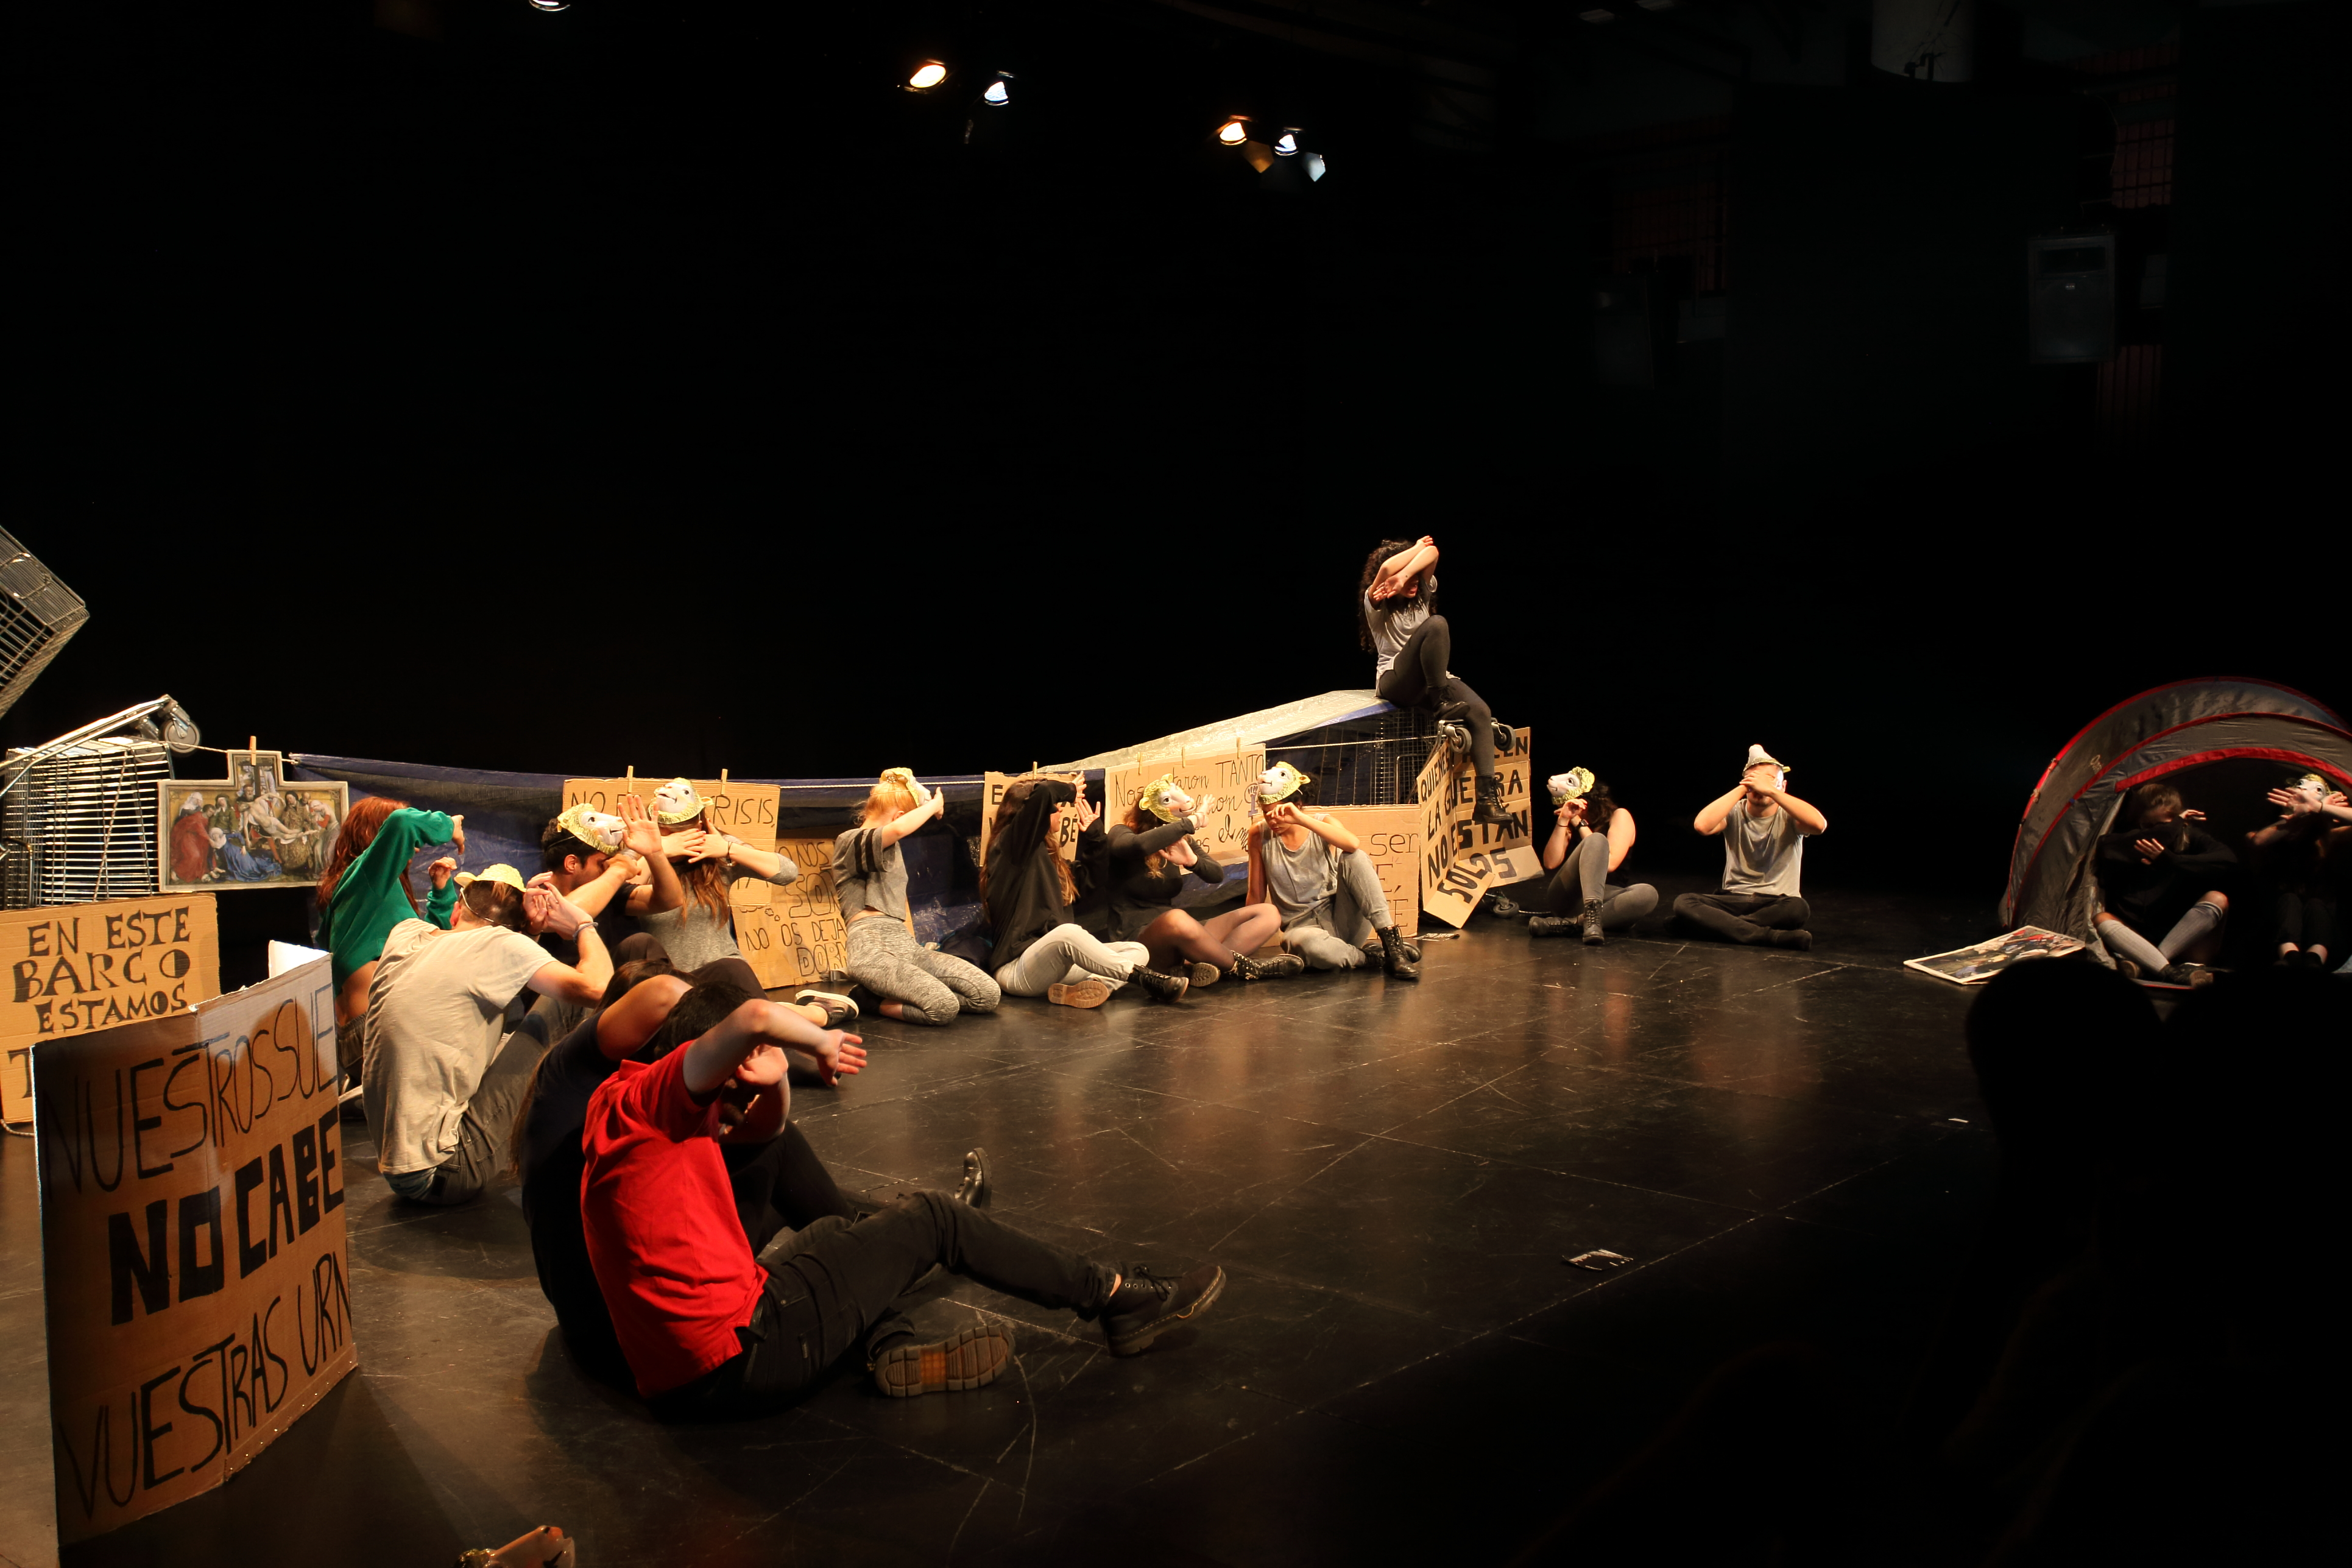 En Defensa. Un concierto de despedida. Aula de Teatre de la Universitat d'Alacant